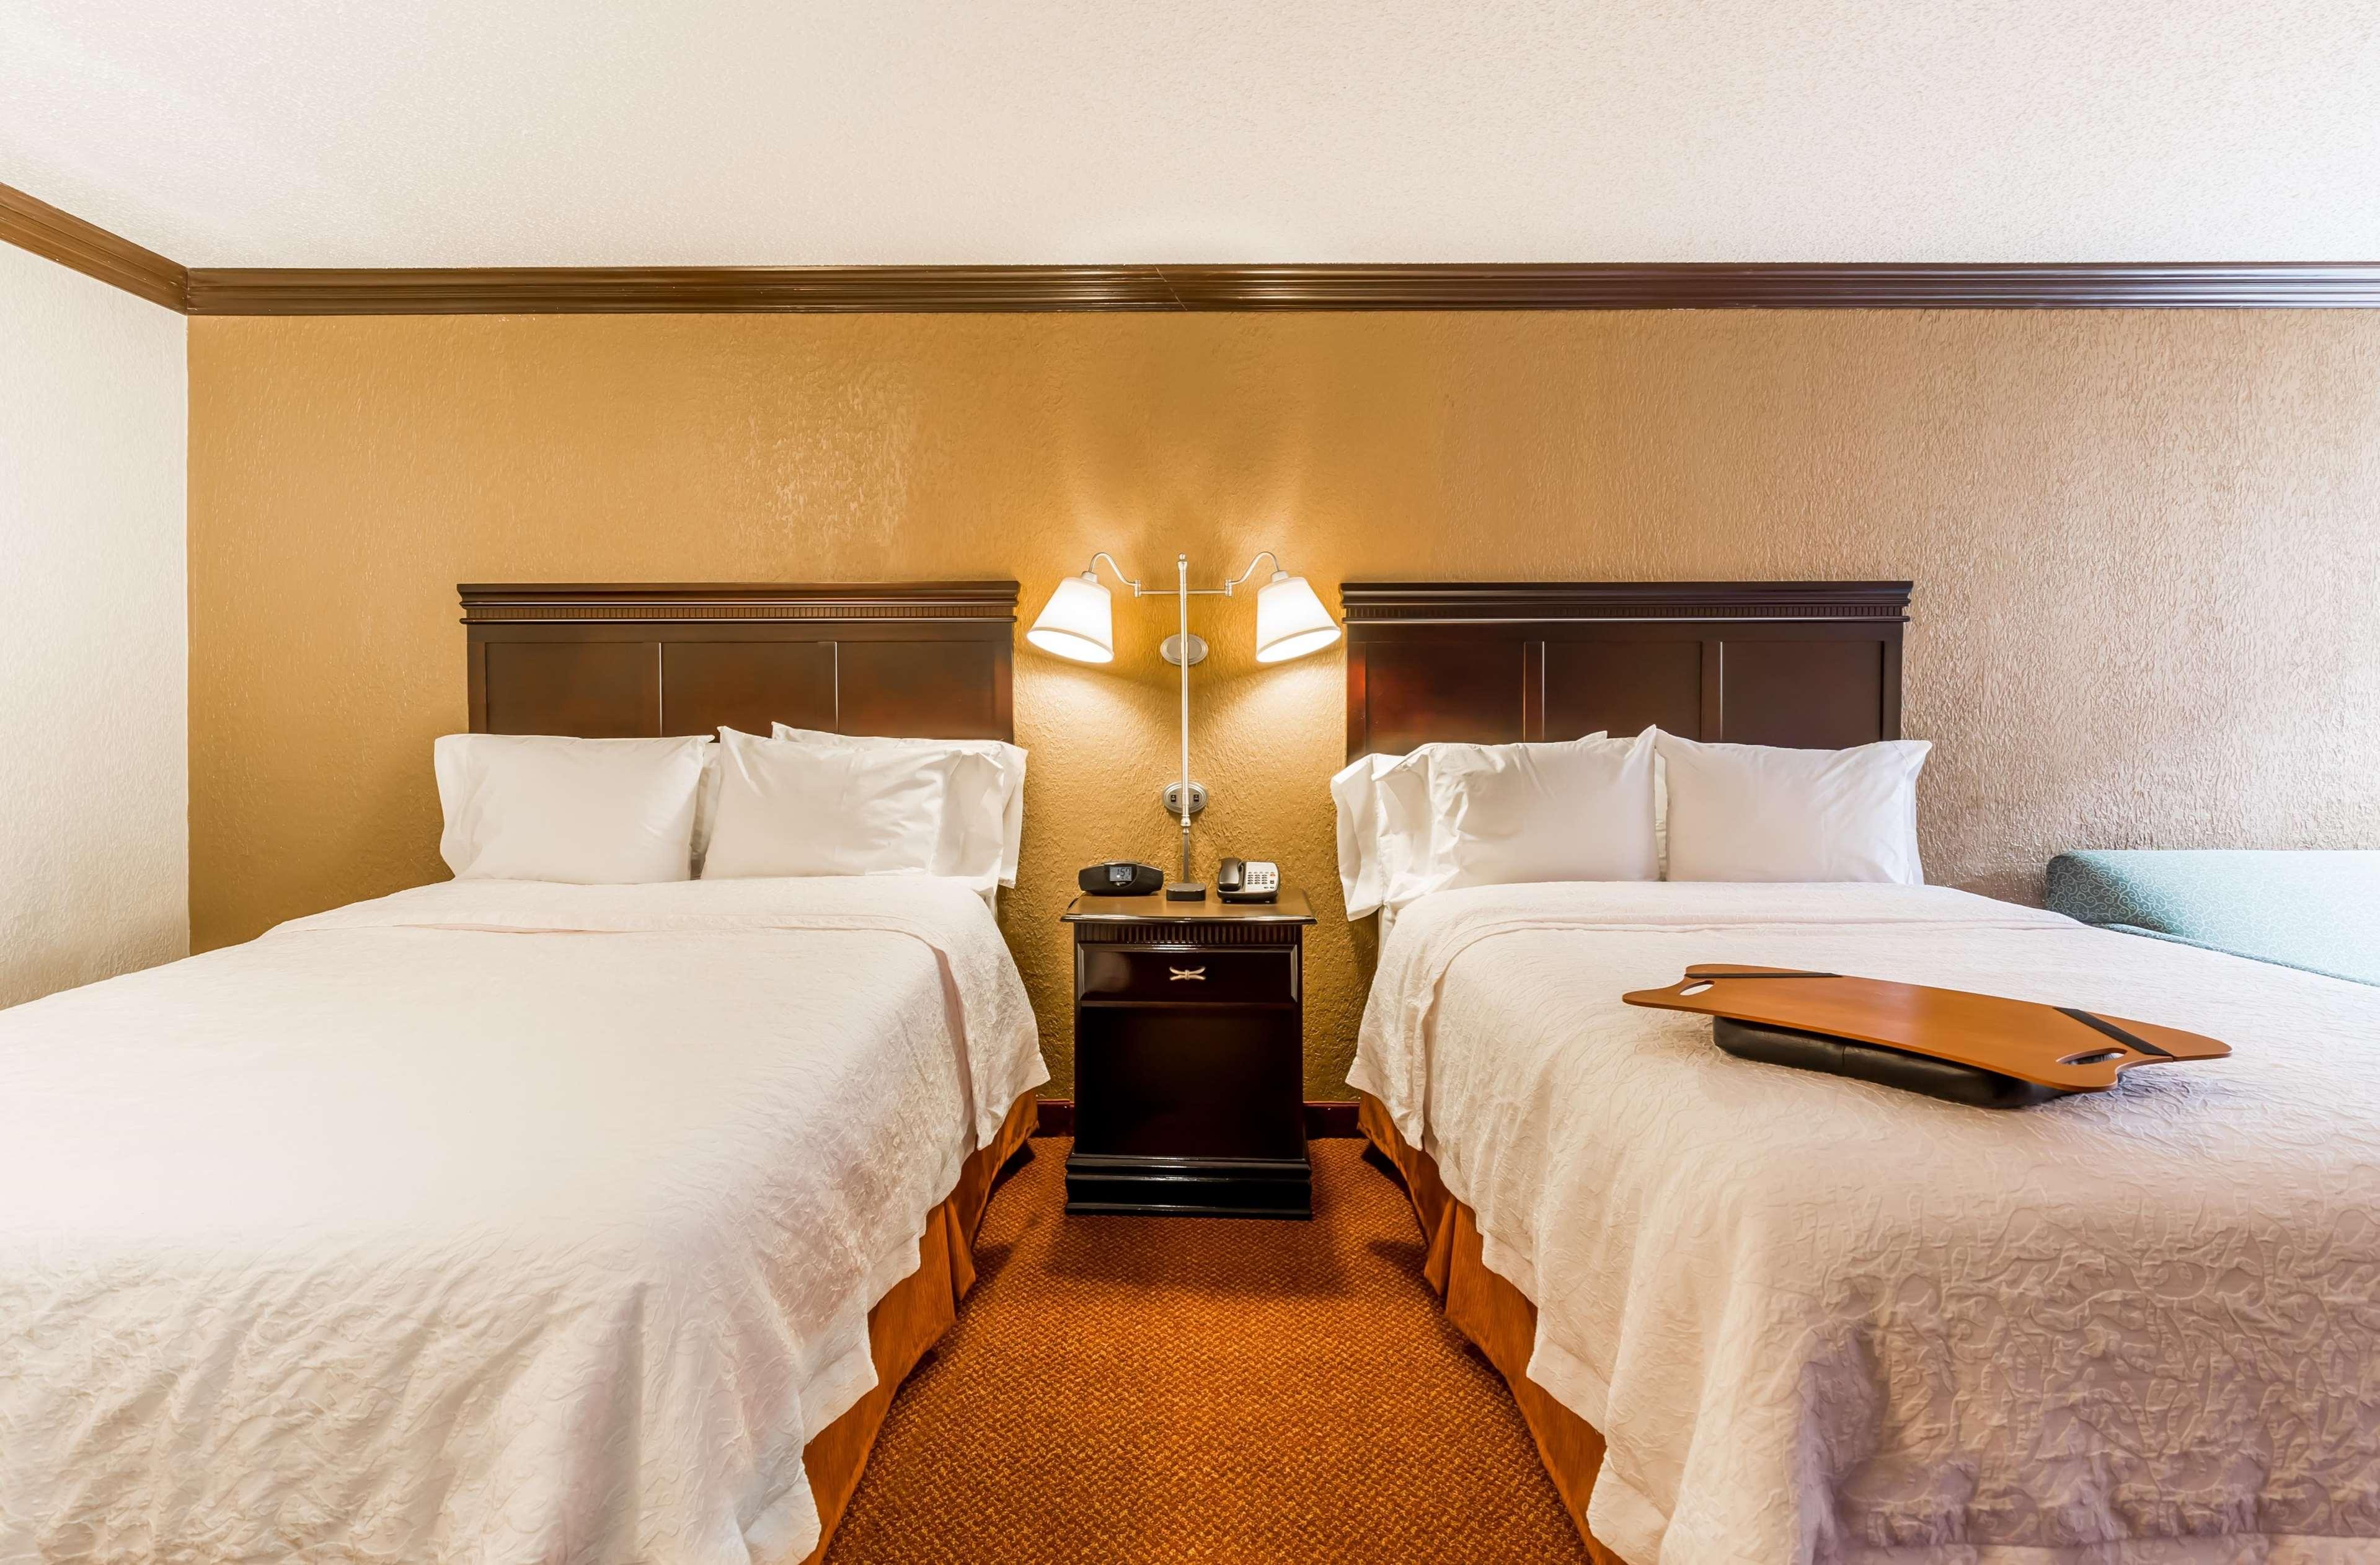 Hampton Inn & Suites Chicago/Hoffman Estates image 39